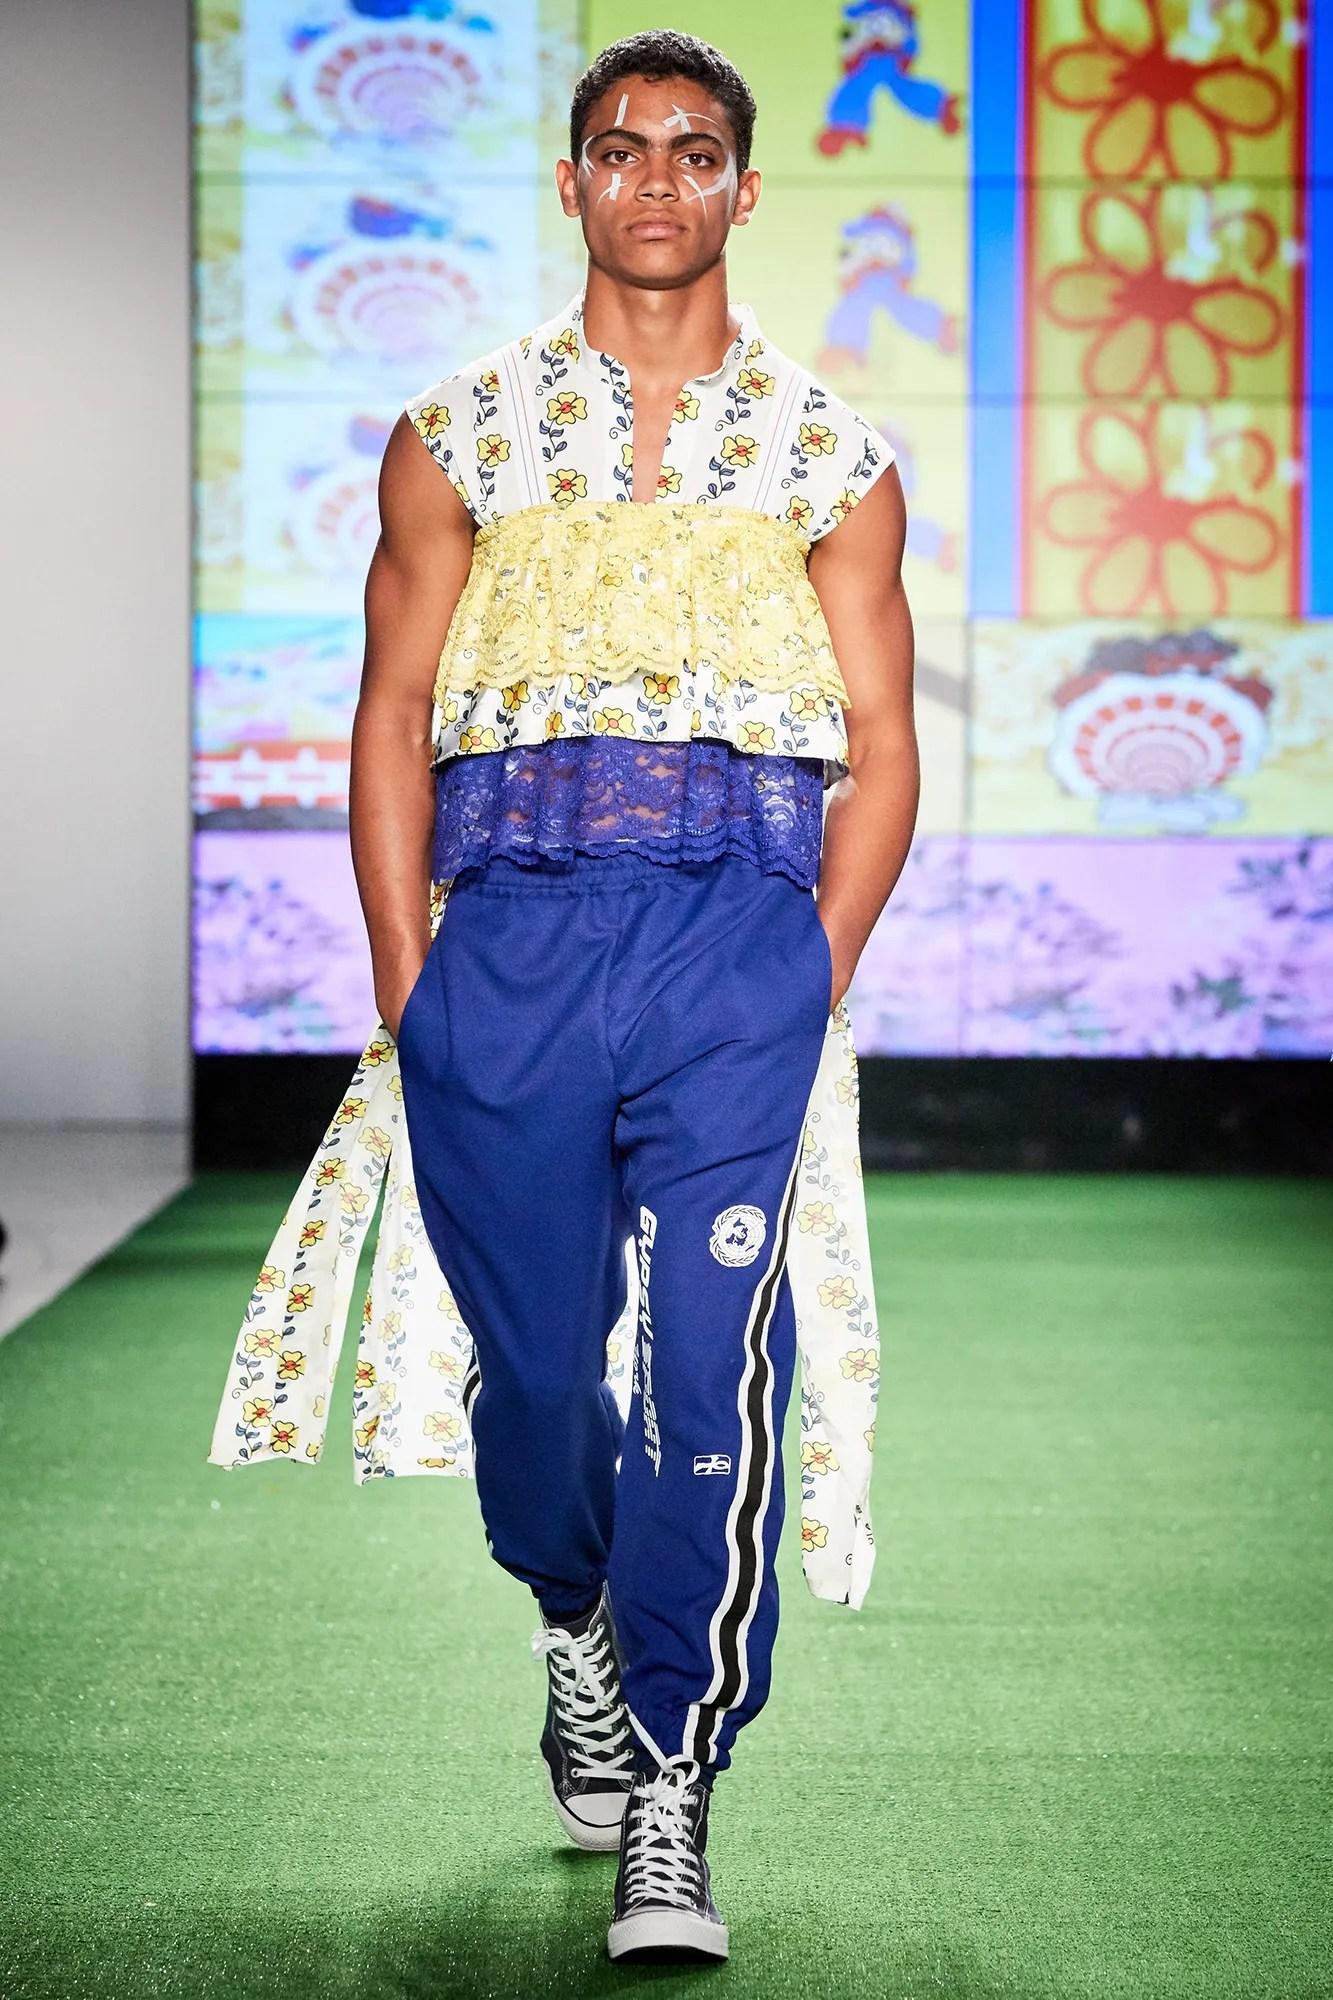 Gypsy Sport SS17 spring/summer 2017 menswear